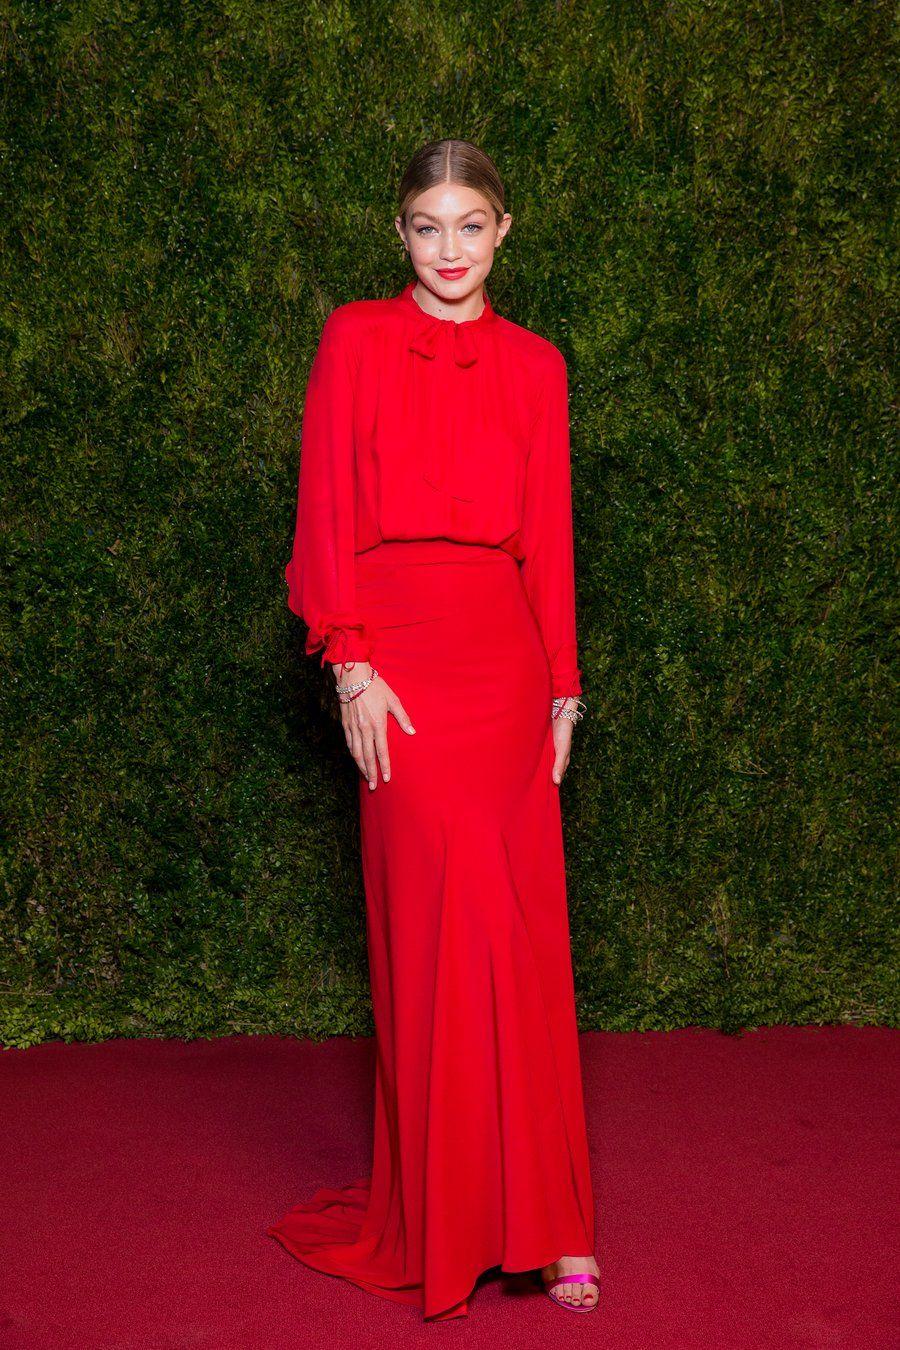 Red Carpet Rules Gigi Hadid Outfits Red Carpet Fashion Gigi Hadid Style [ 1350 x 900 Pixel ]